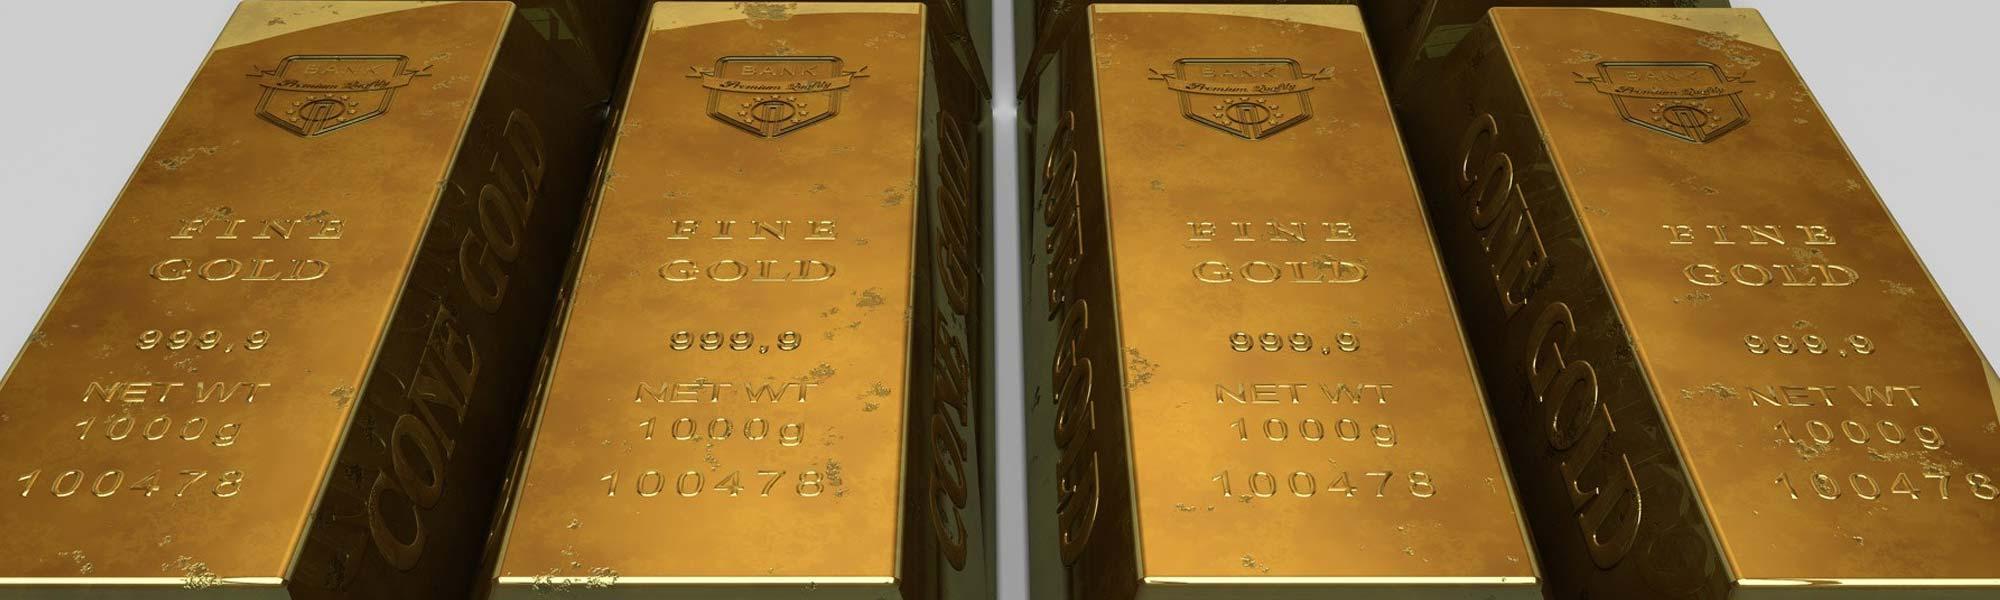 Gold Price Manipulation